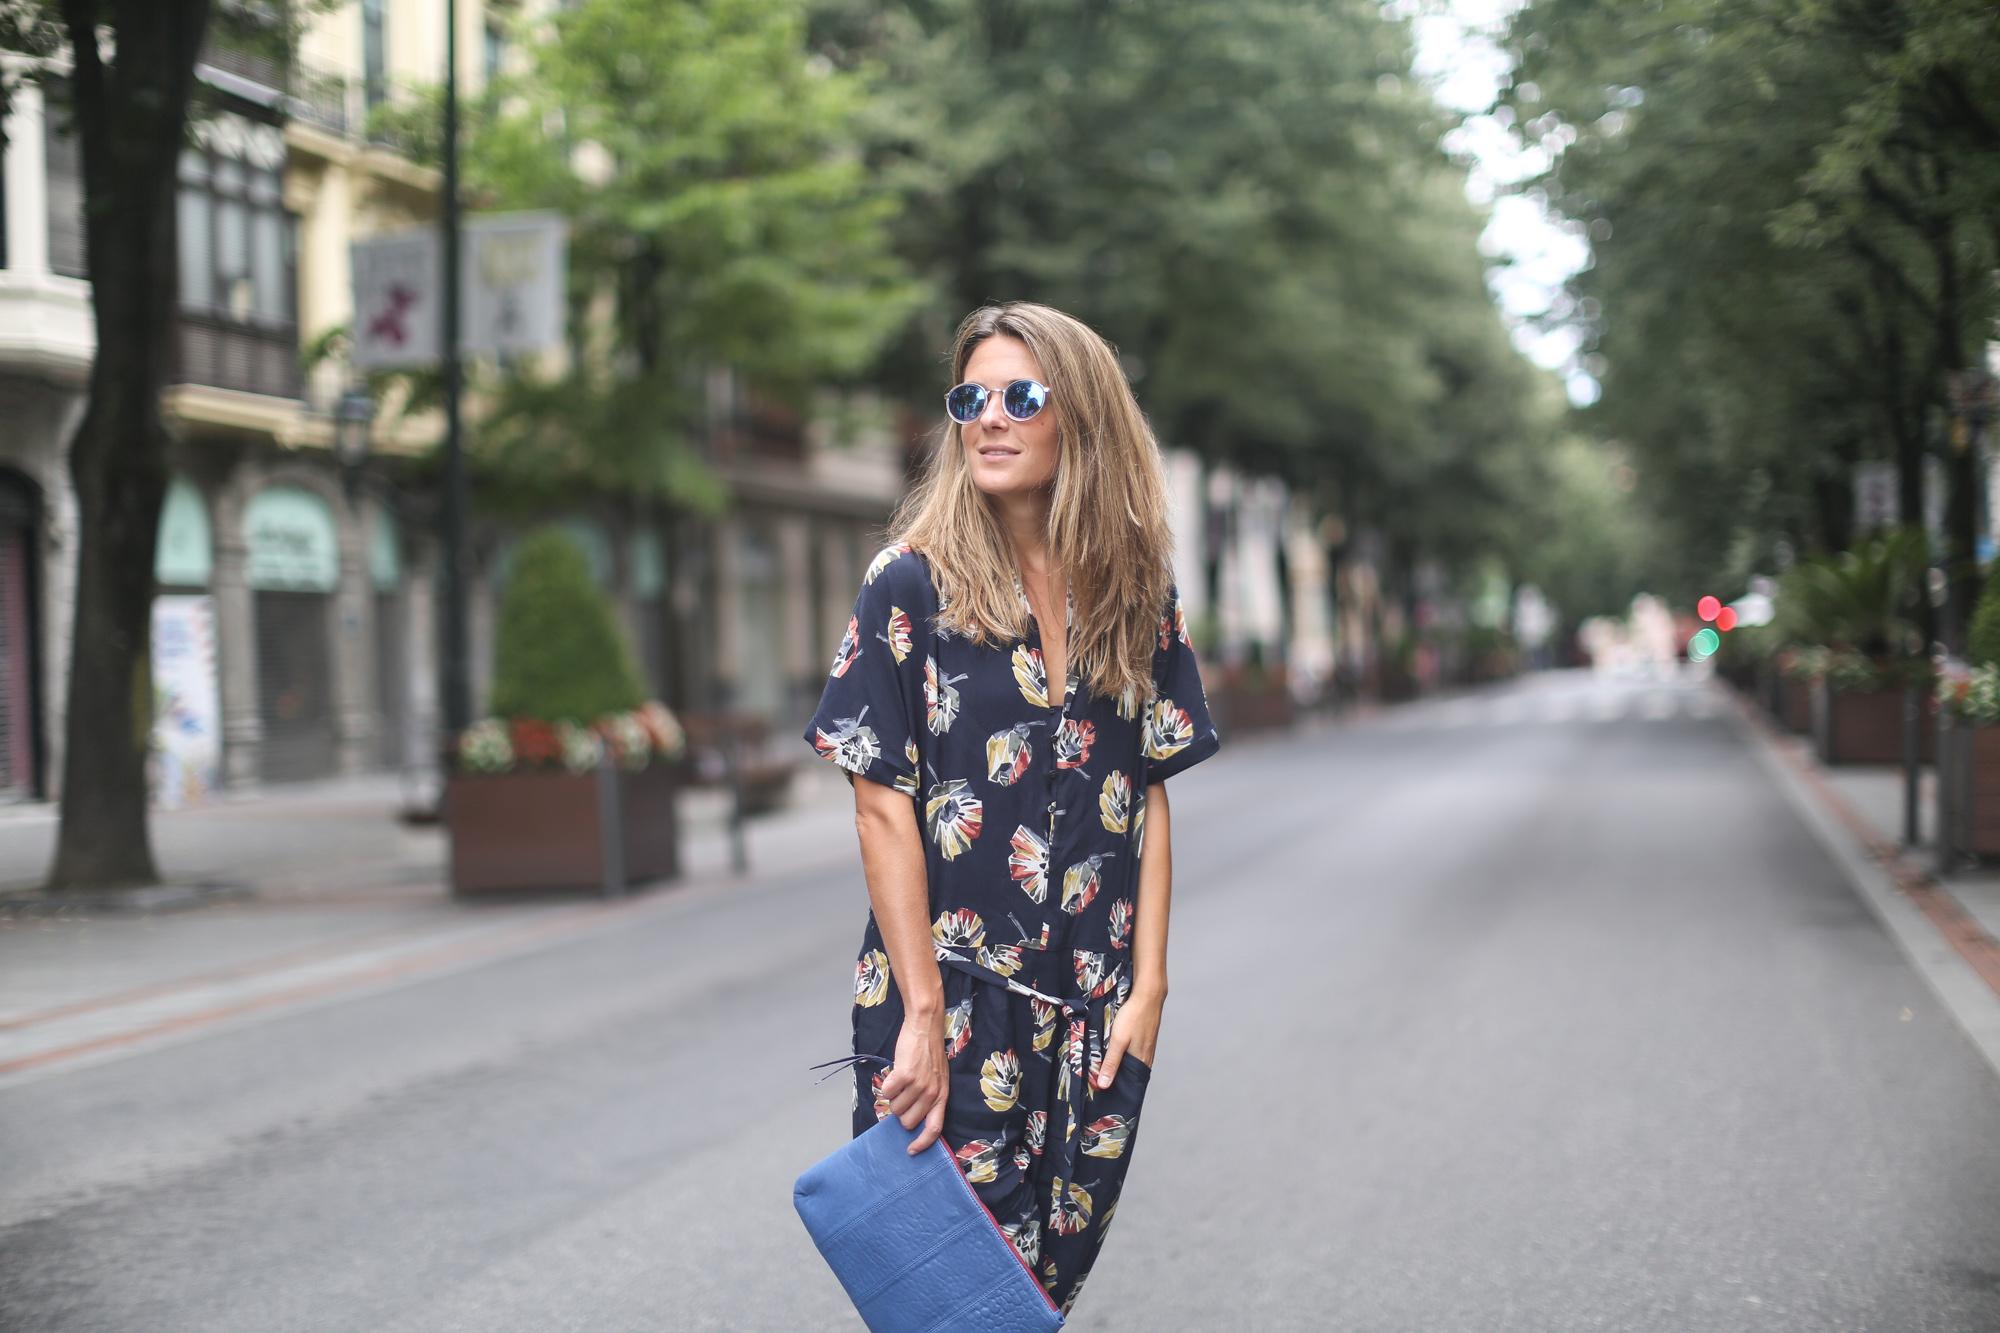 Clochet_streetstyle_zara_floral_jumpsuit_artemisia_leather_clutch-3